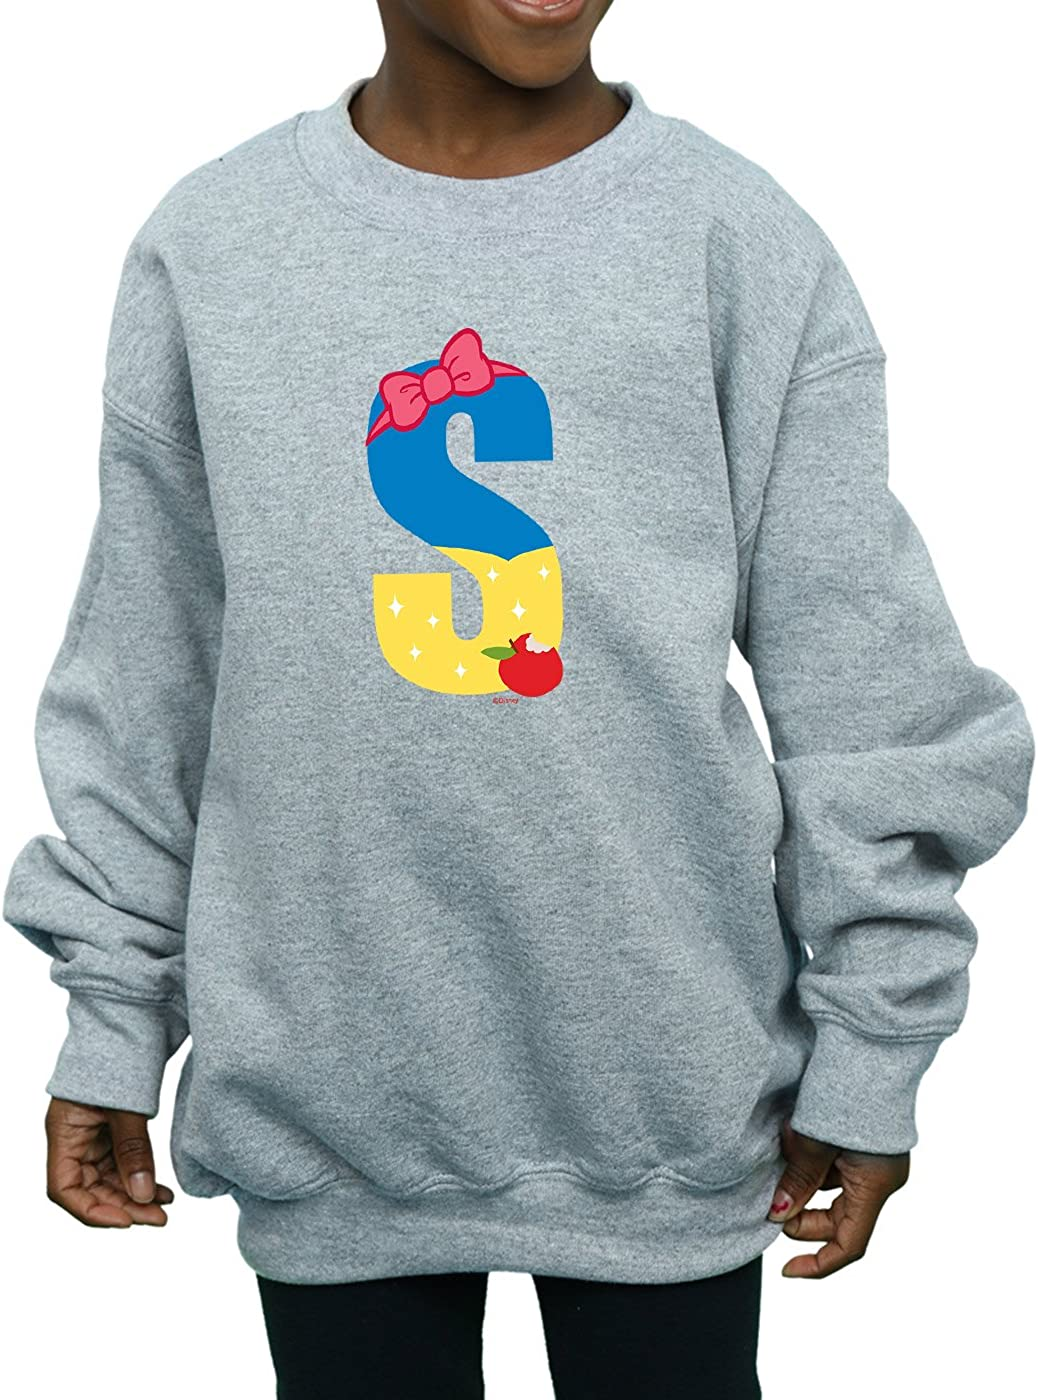 Disney Girls Alphabet S Is For Snow White Sweatshirt Sport Grey 9-11 Years